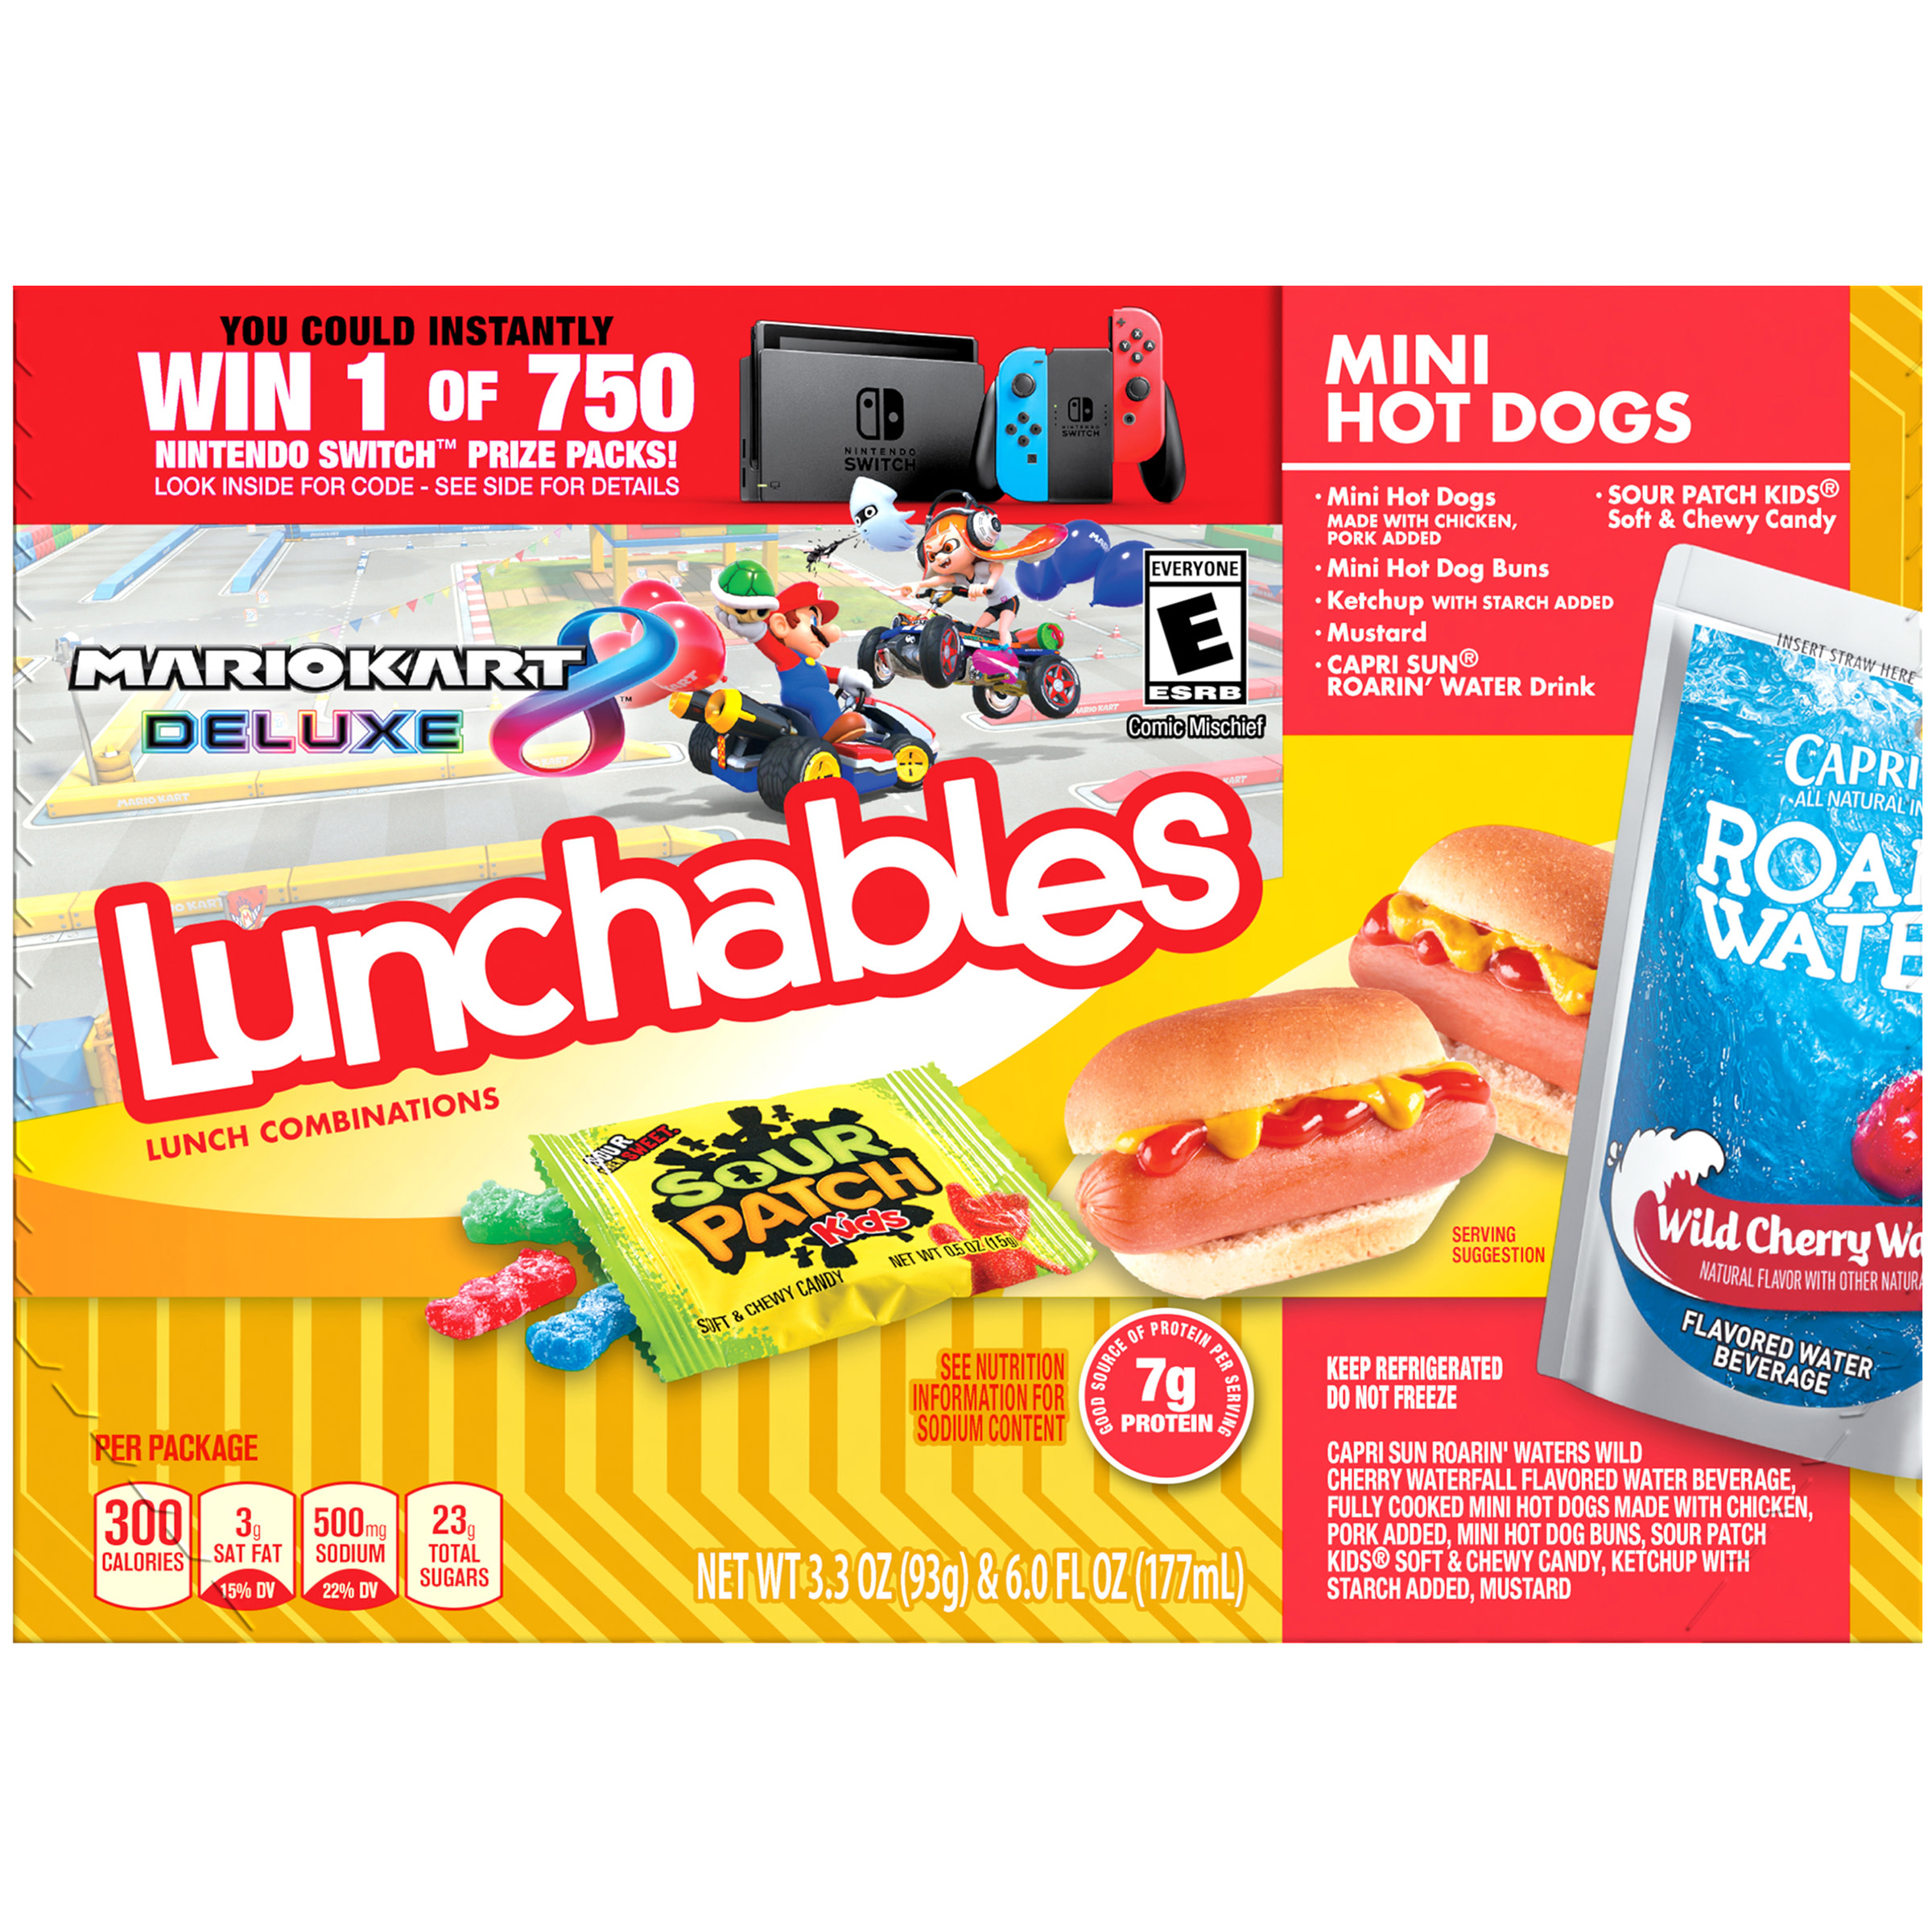 Lunchables Lunch Combinations Mini Hot Dogs 9 3 Oz Box Walmart Com Walmart Com